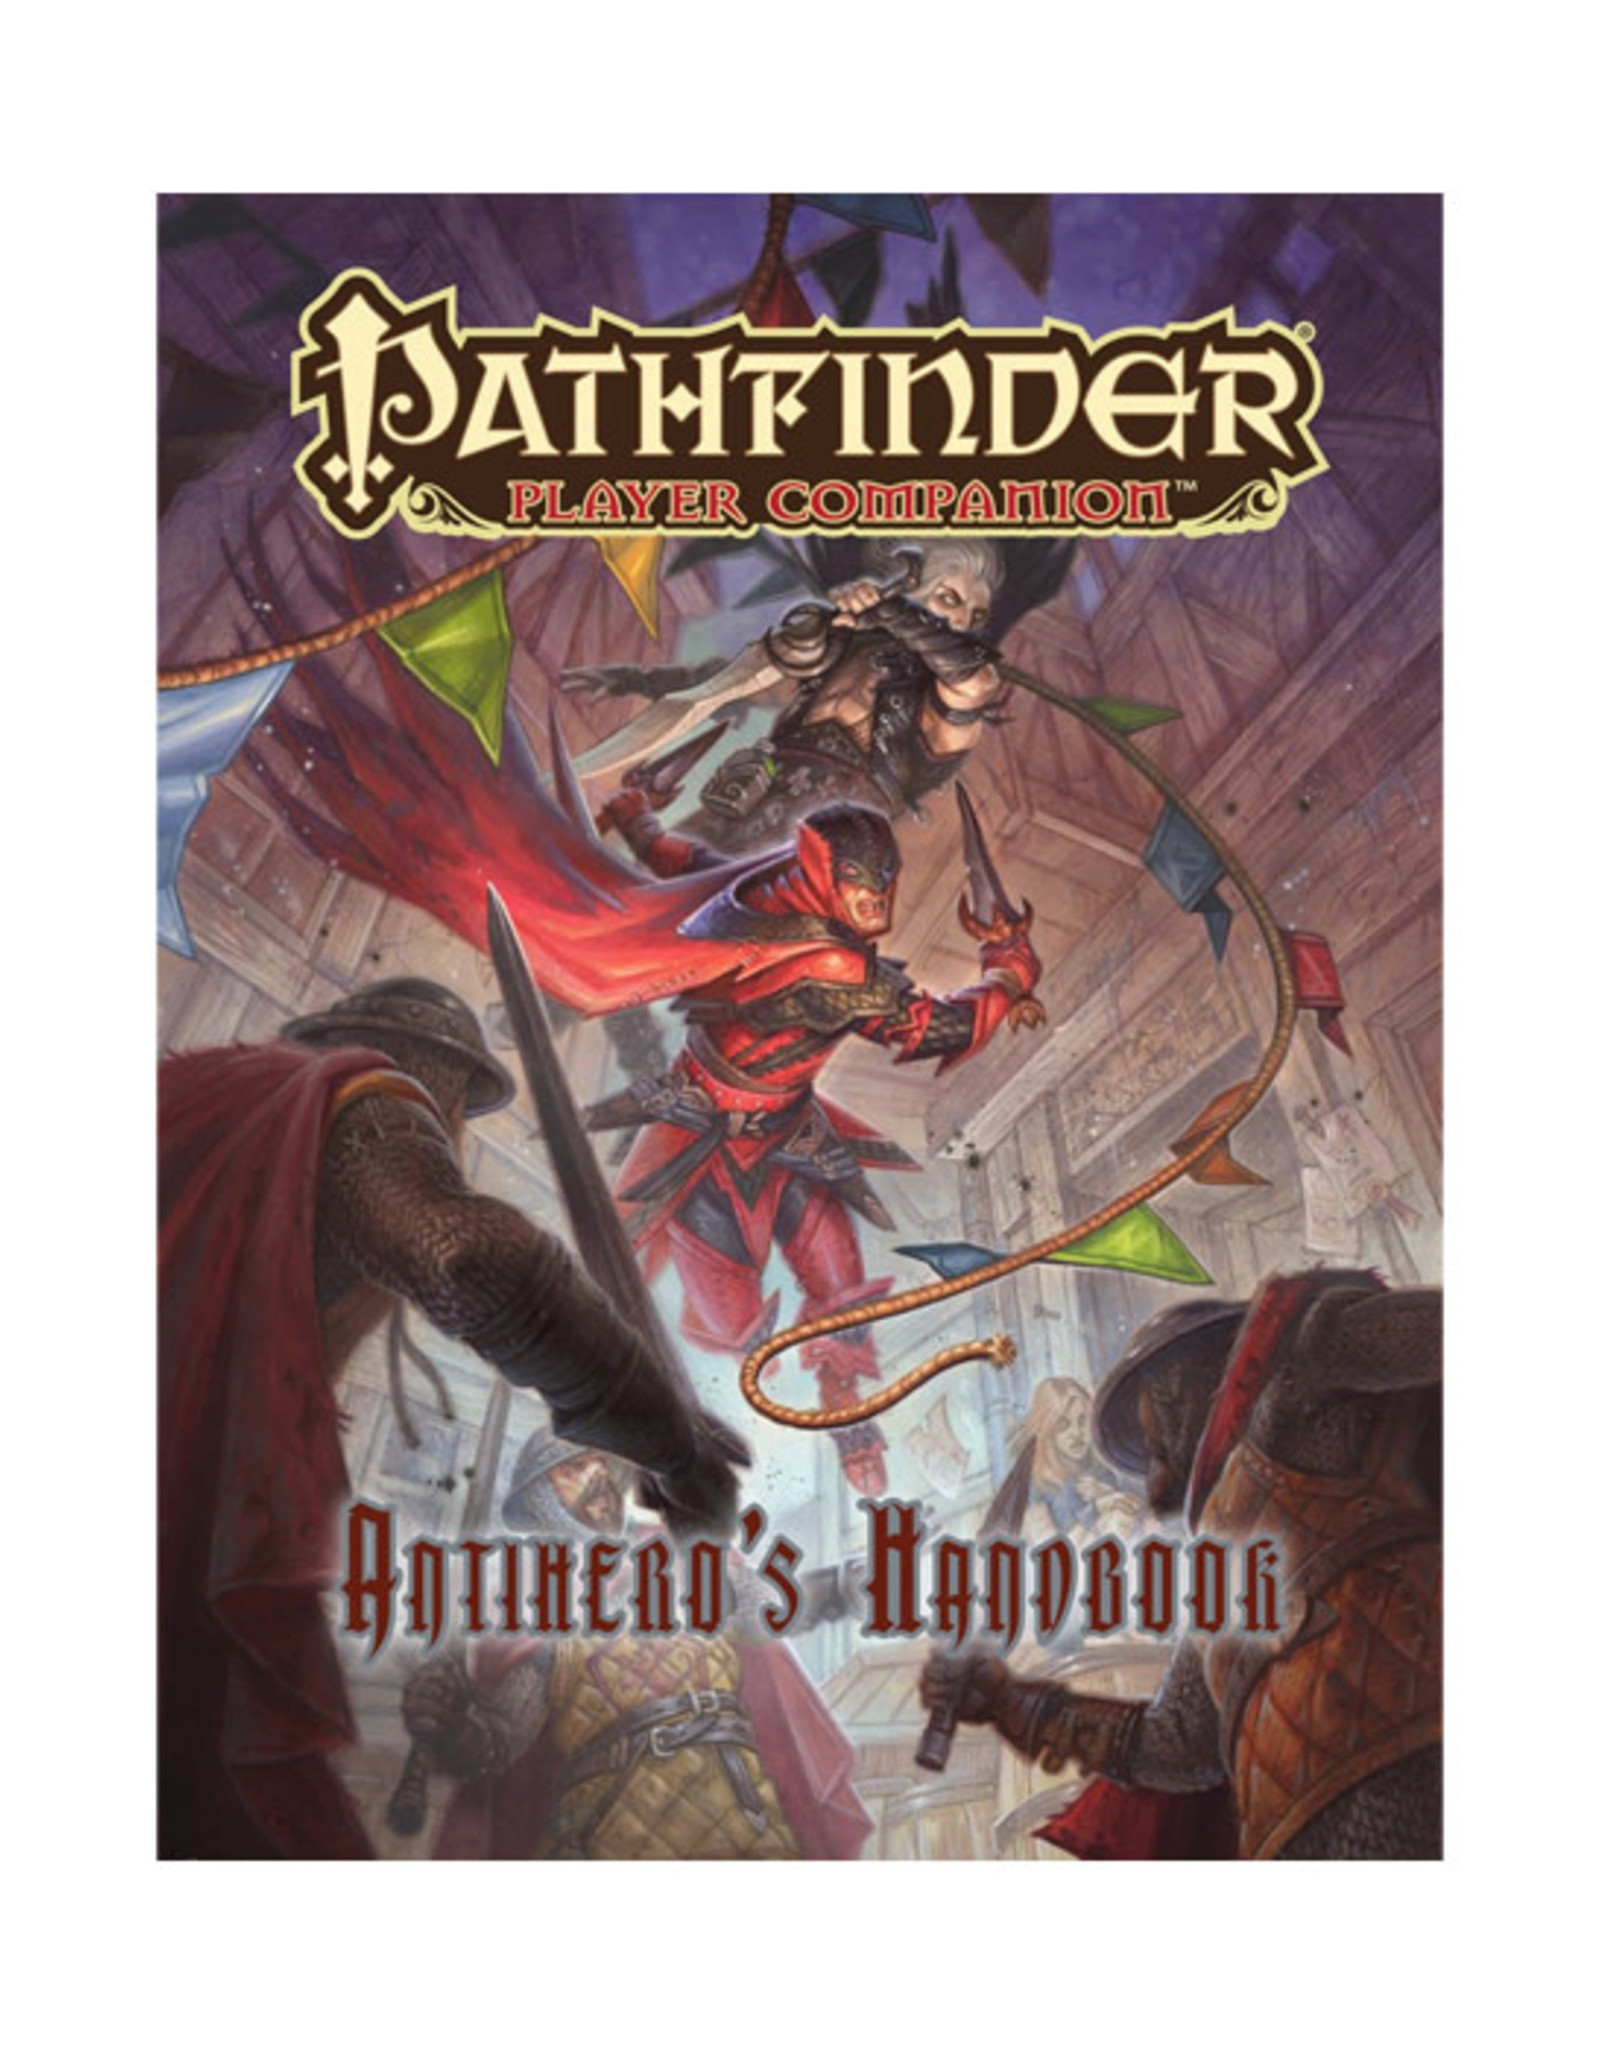 Pathfinder Pathfinder: Player Companion - Antihero's Handbook